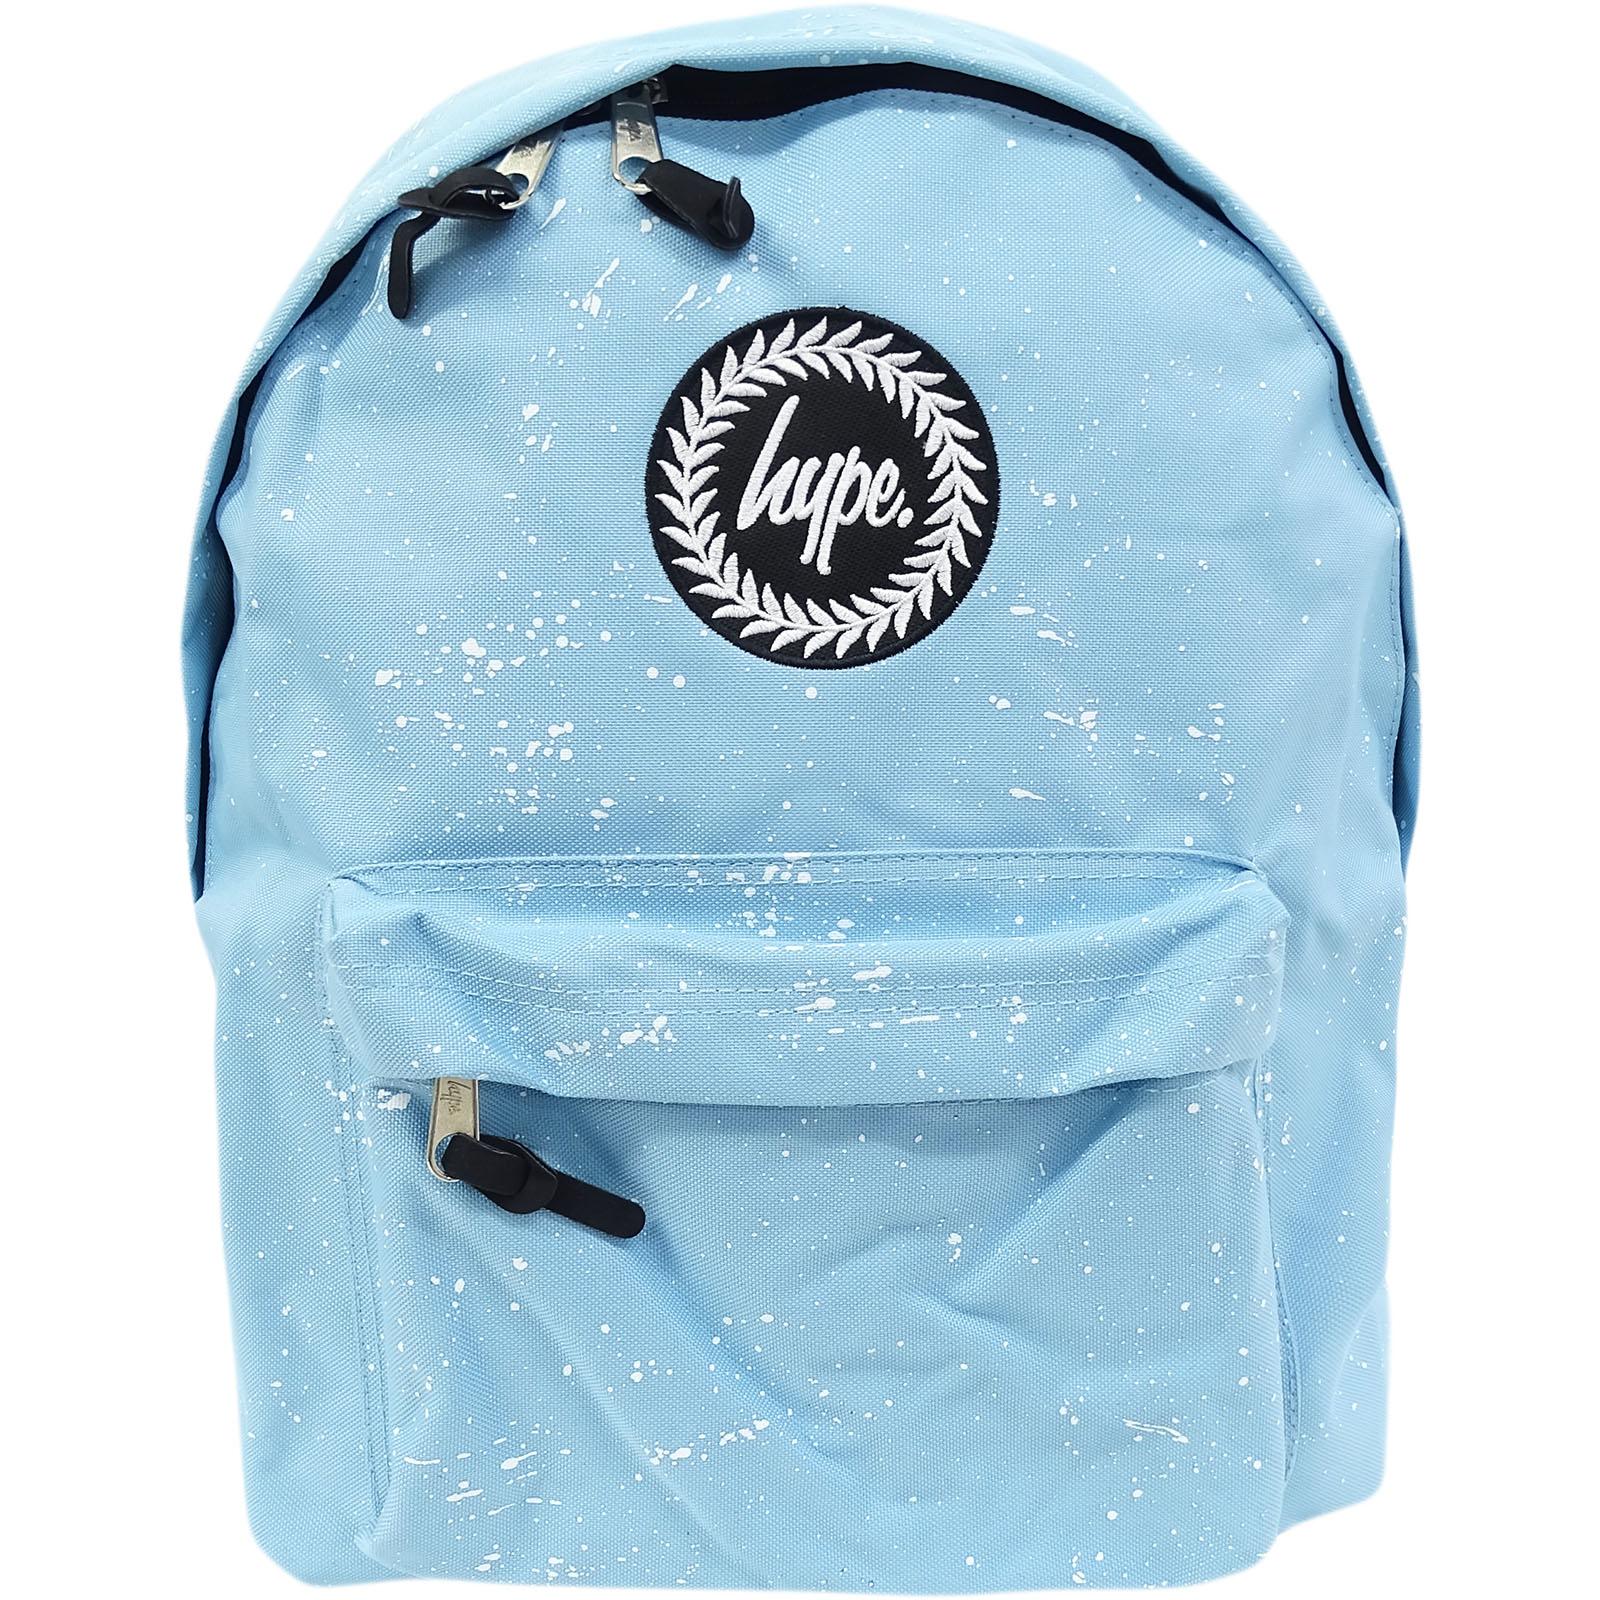 Unisexe-Hype-Sac-A-Dos-Ecole-Gym-SACS-pochettes-pencil-case miniature 184